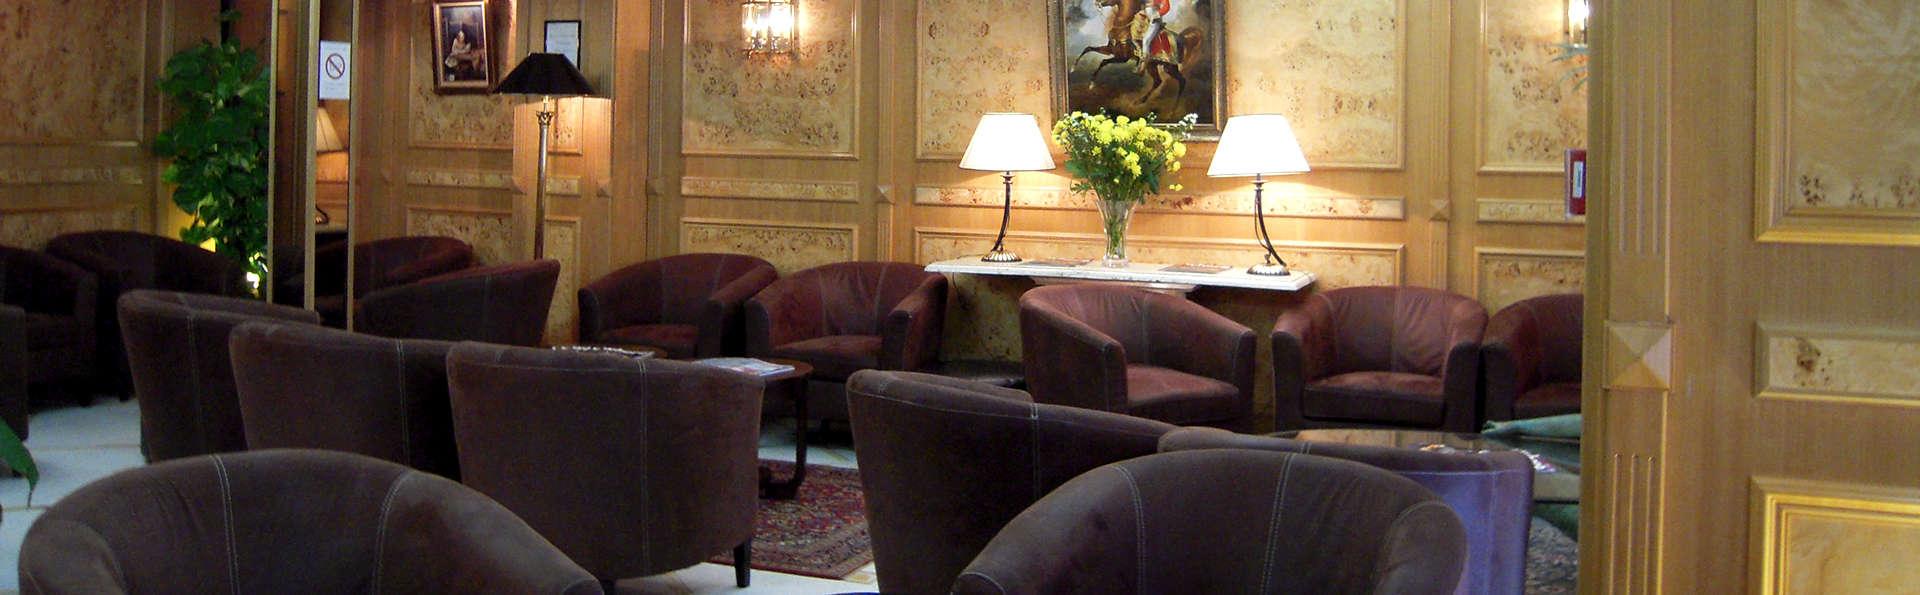 Hôtel Princesse Caroline - Edit_Lobby.jpg